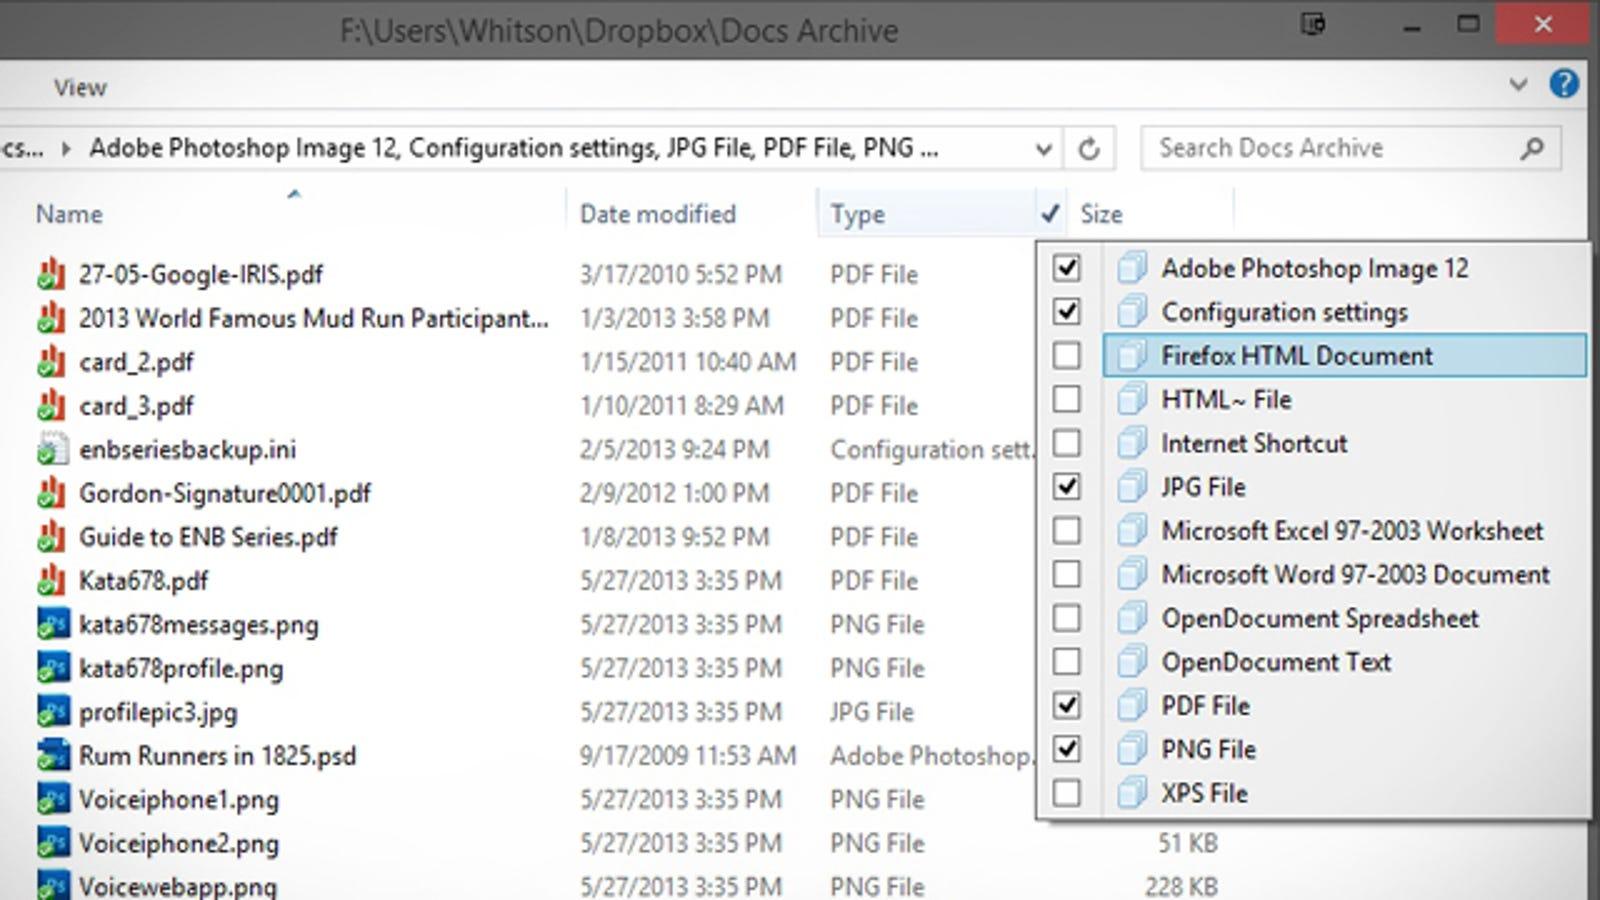 Get More Powerful Sorting Options in Windows Explorer